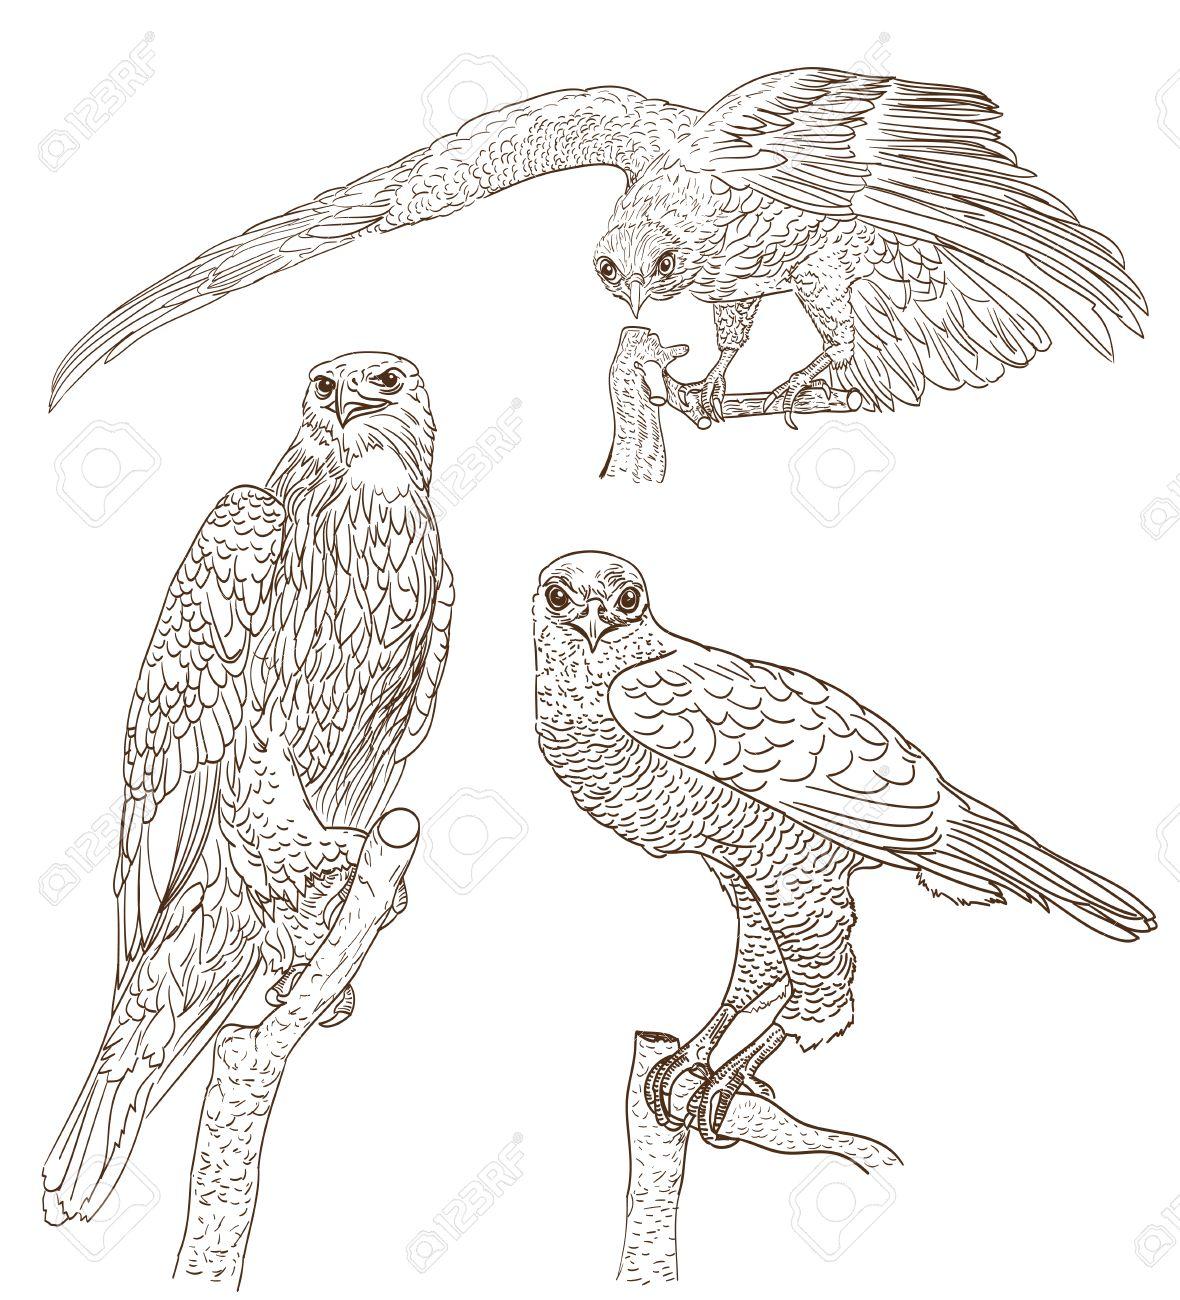 set of drawings of birds of prey royalty free cliparts vectors